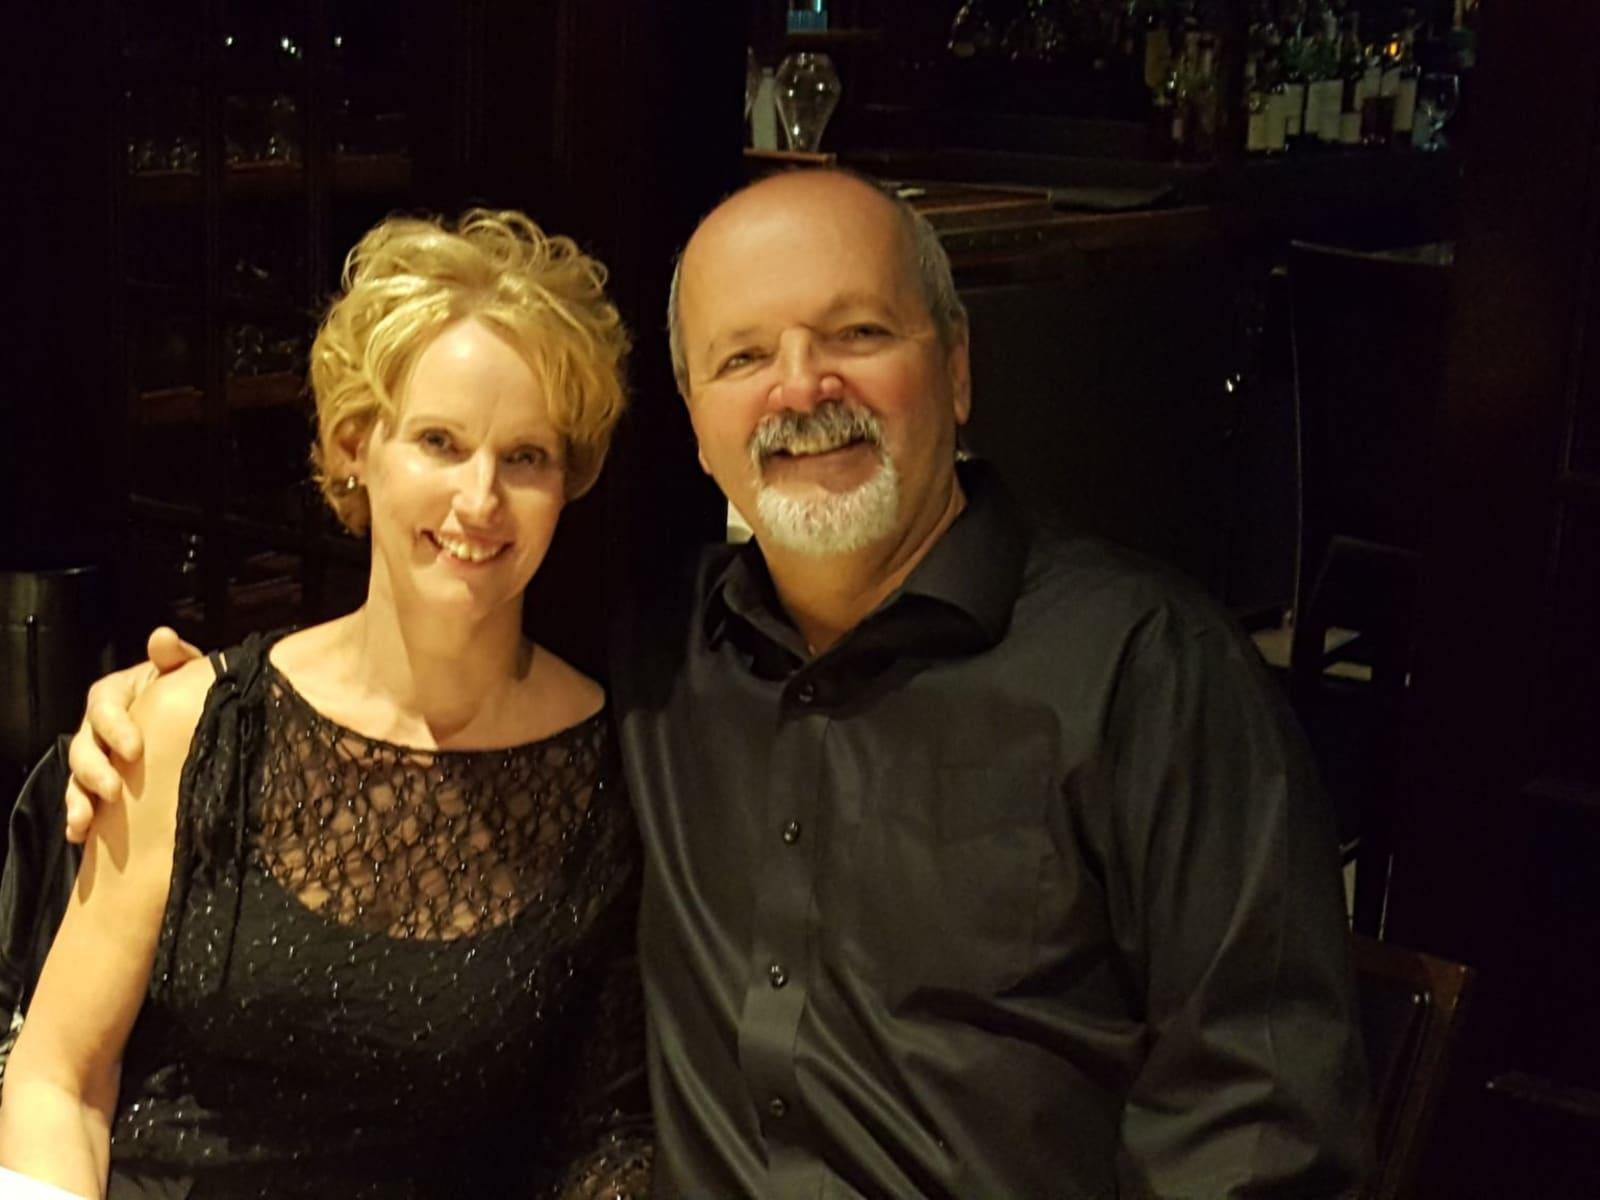 Theresa & Mark from Orillia, Ontario, Canada